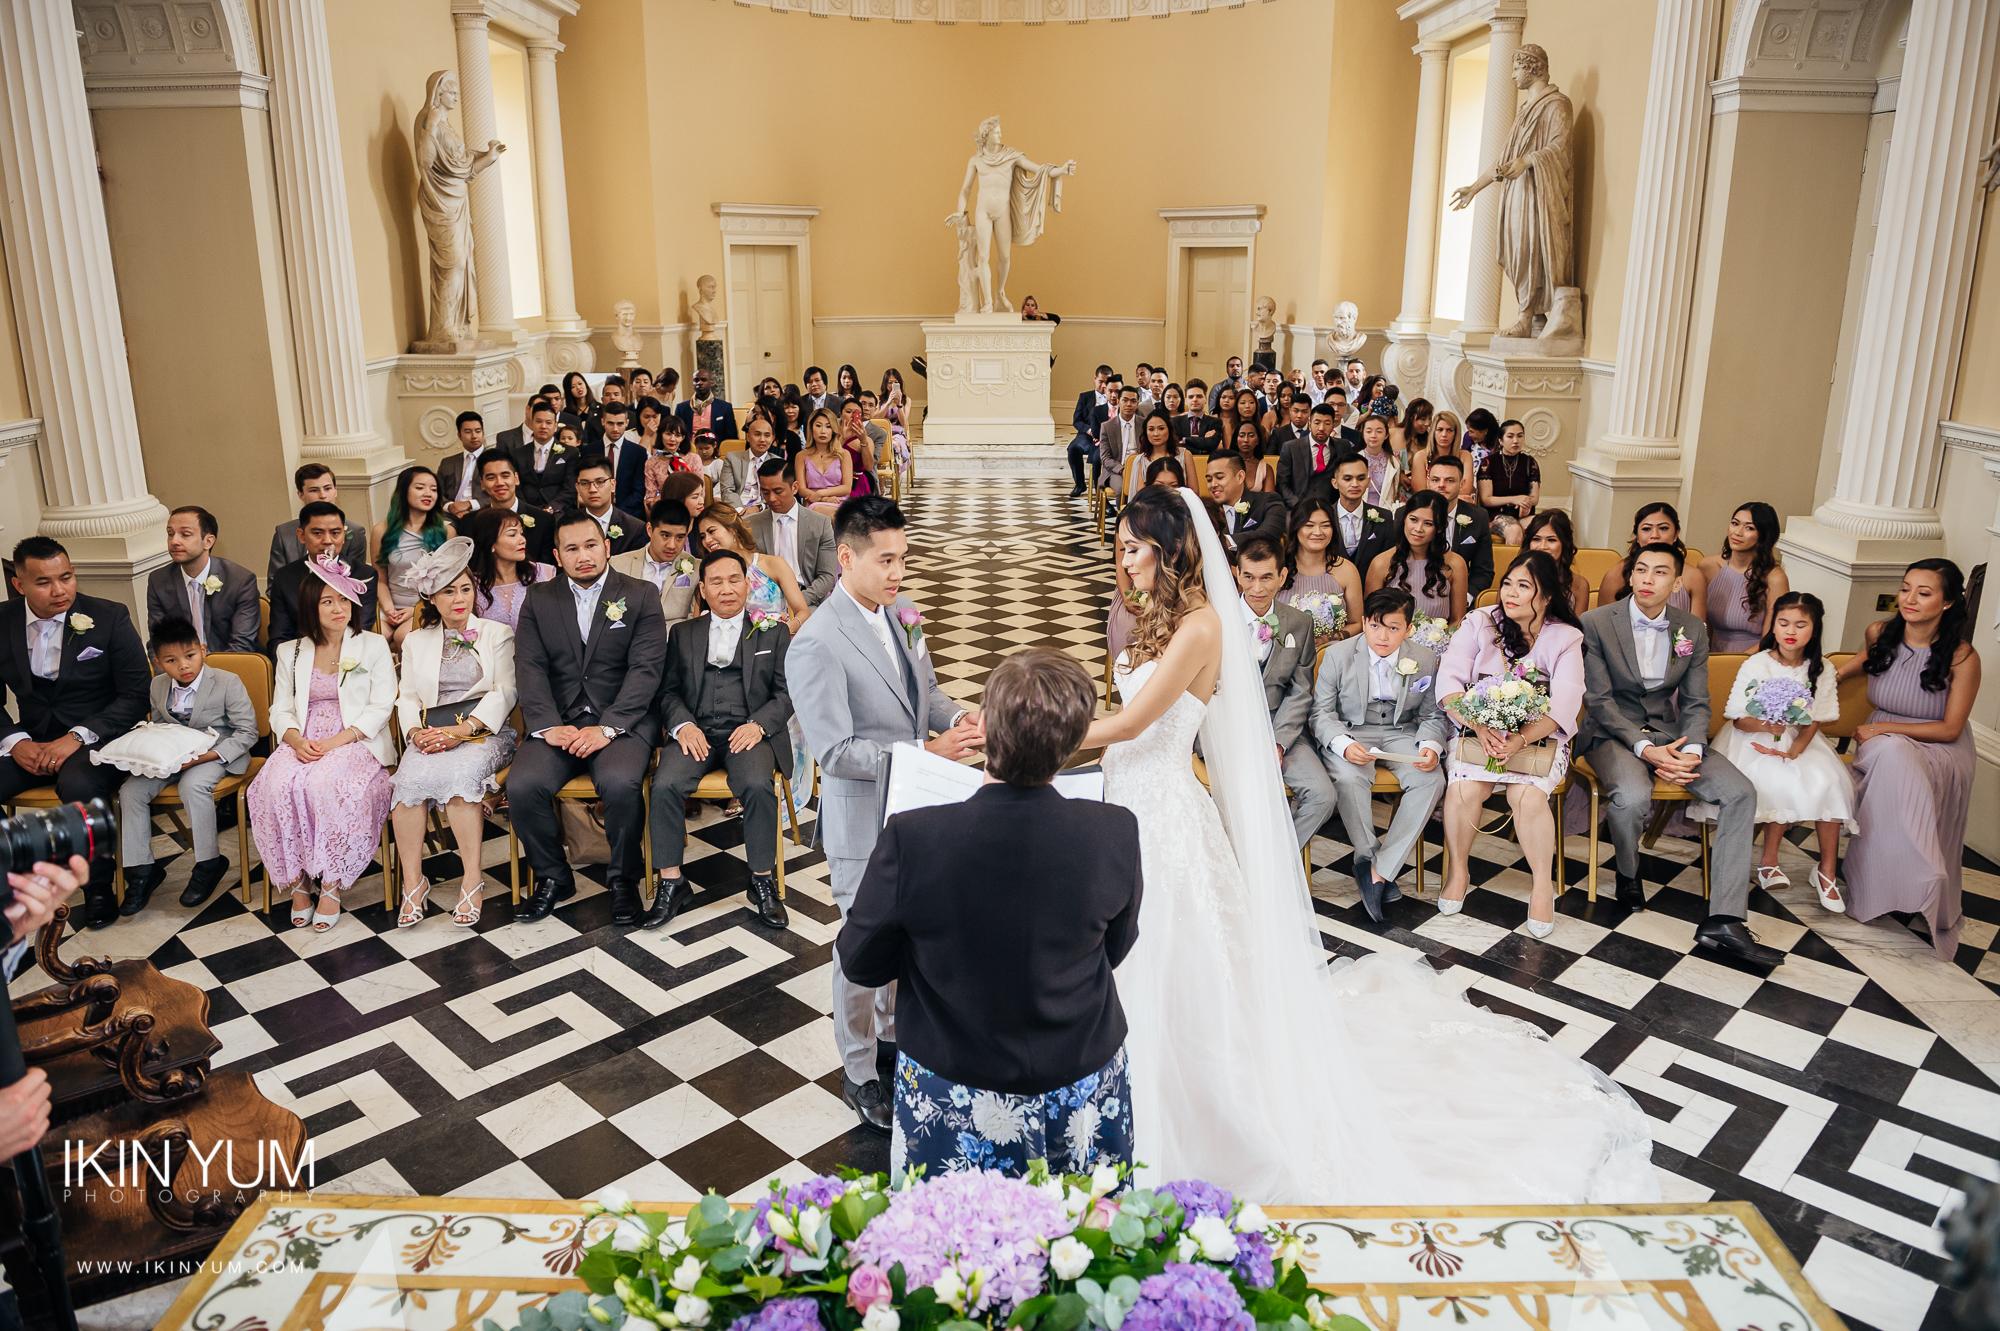 Syon Park Wedding - Ikin Yum Photography -054.jpg